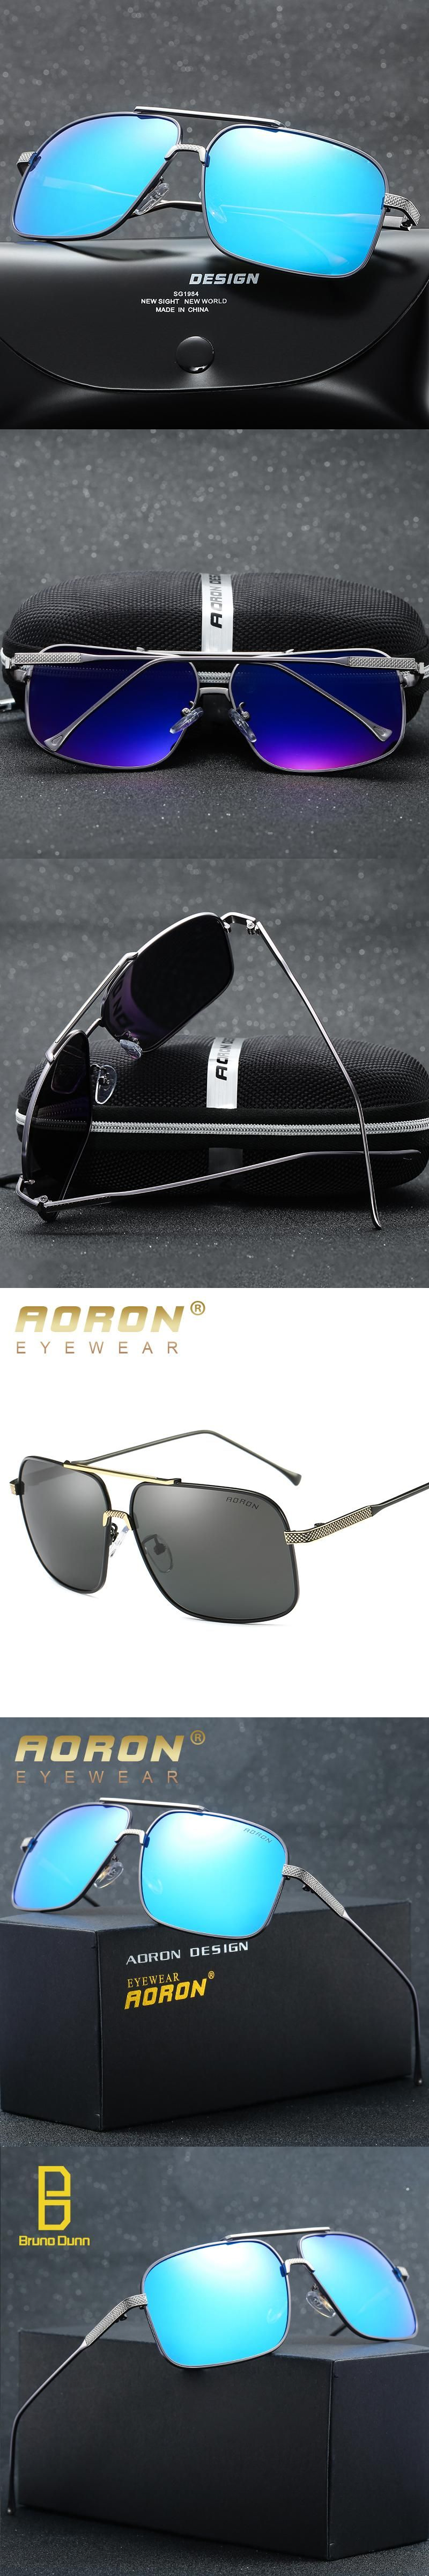 c68b167095c02 TOP HD Polarized Men Sunglasses 2017 Women Sun Glases Male Vintage Brand  Designer oculos de sol